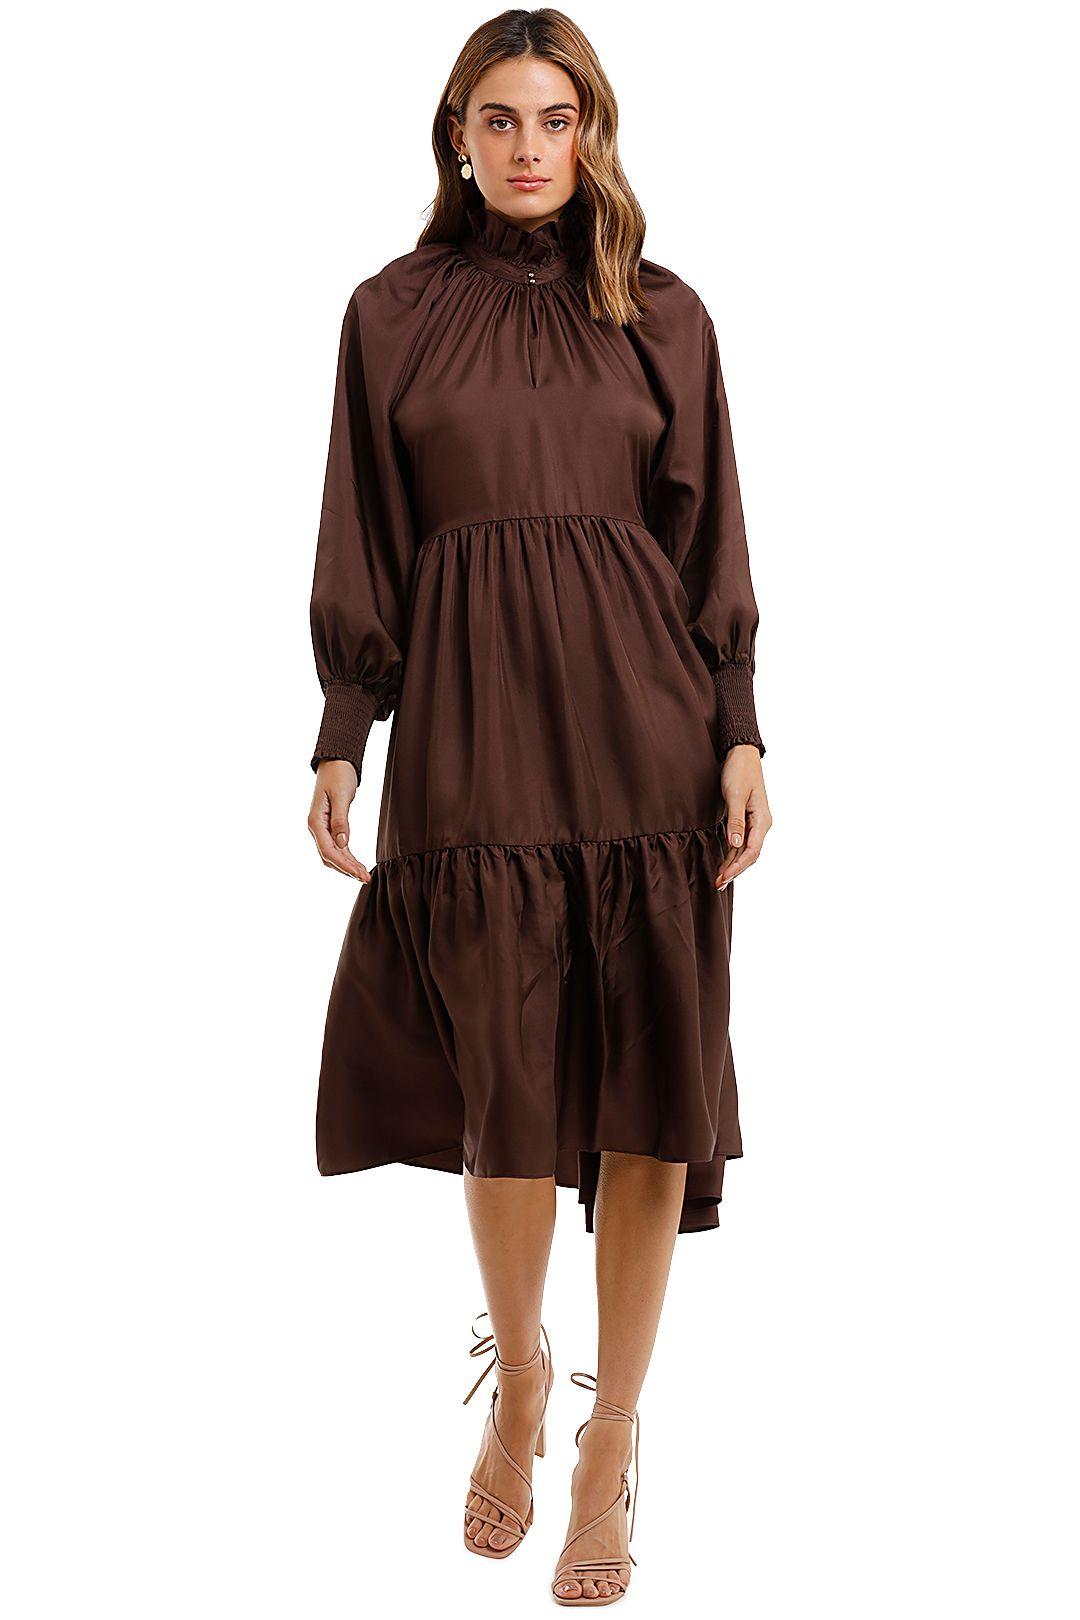 Husk Manor Dress Chocolate Brown